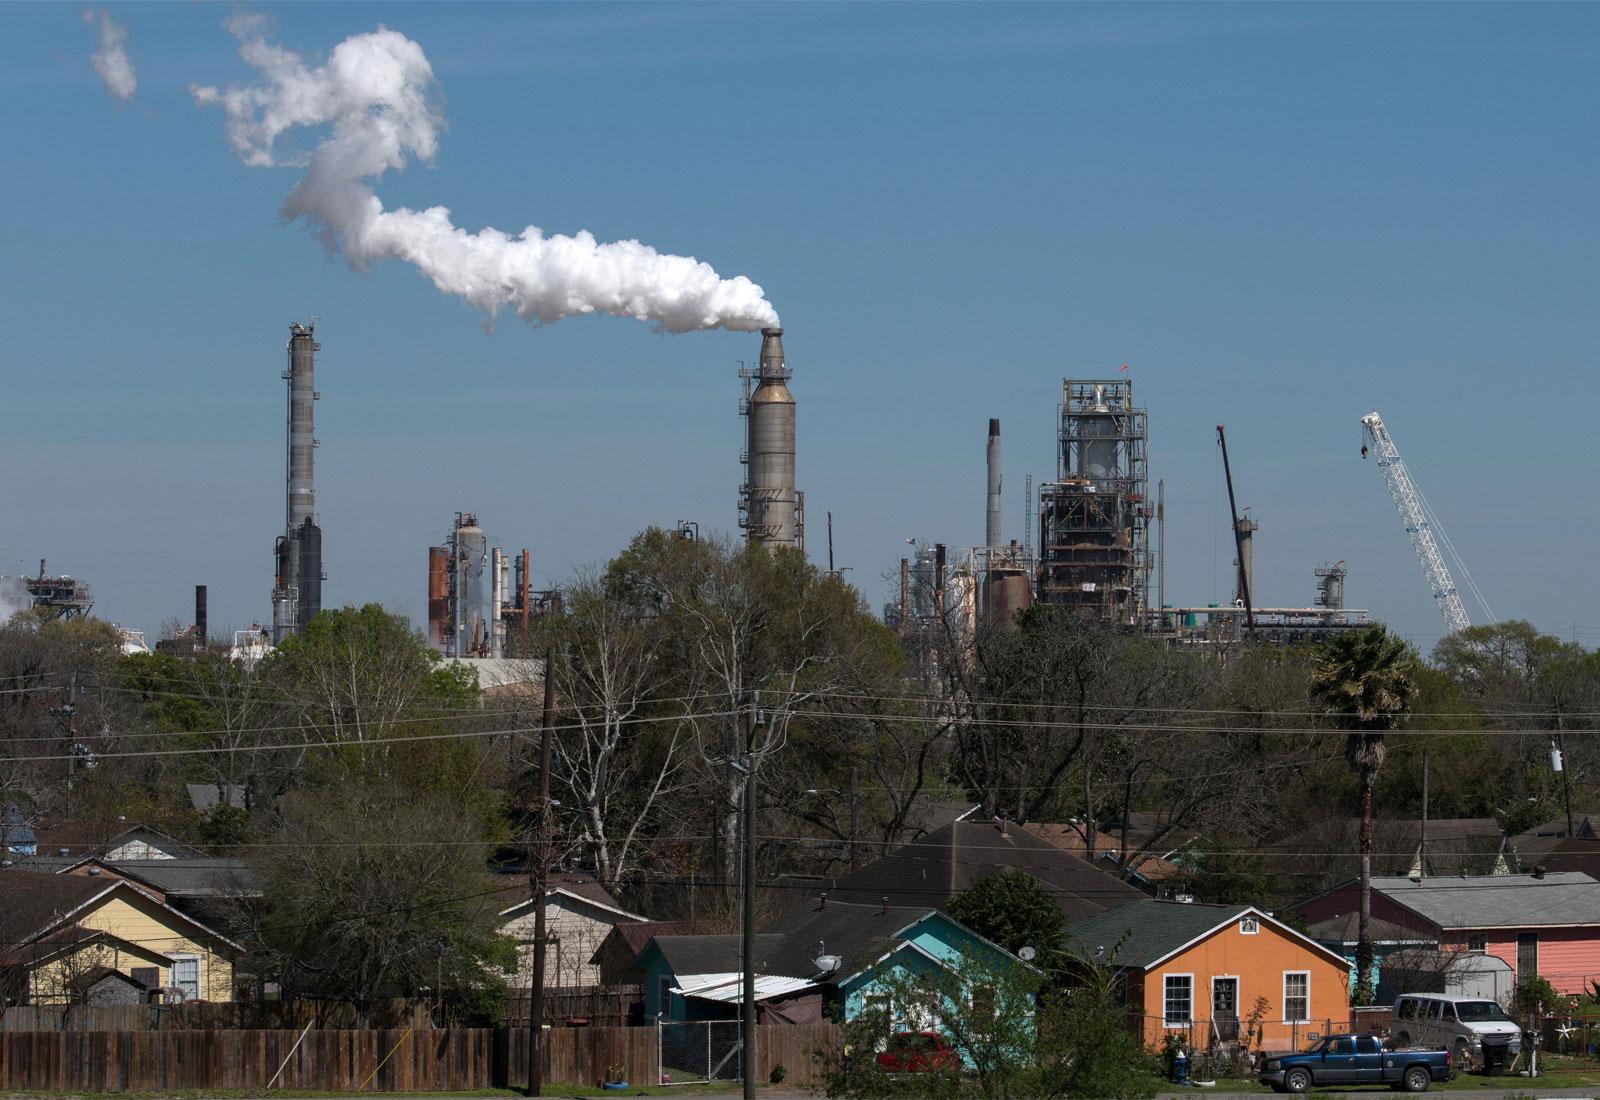 The Valero oil refinery in Houston, Texas